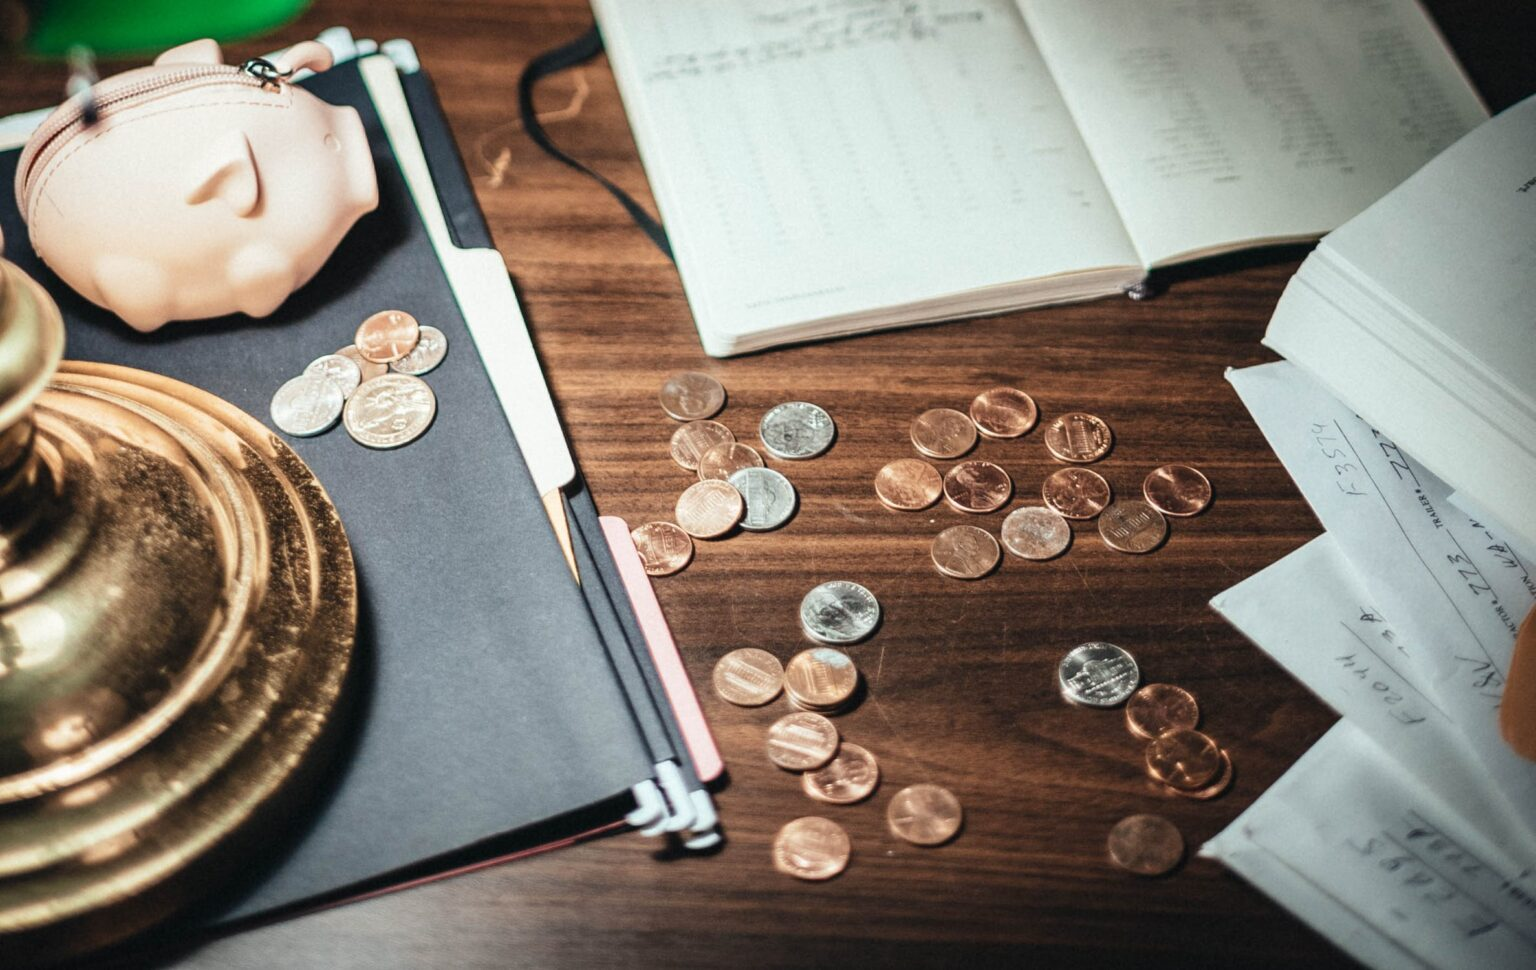 Beneficiary designations override wills